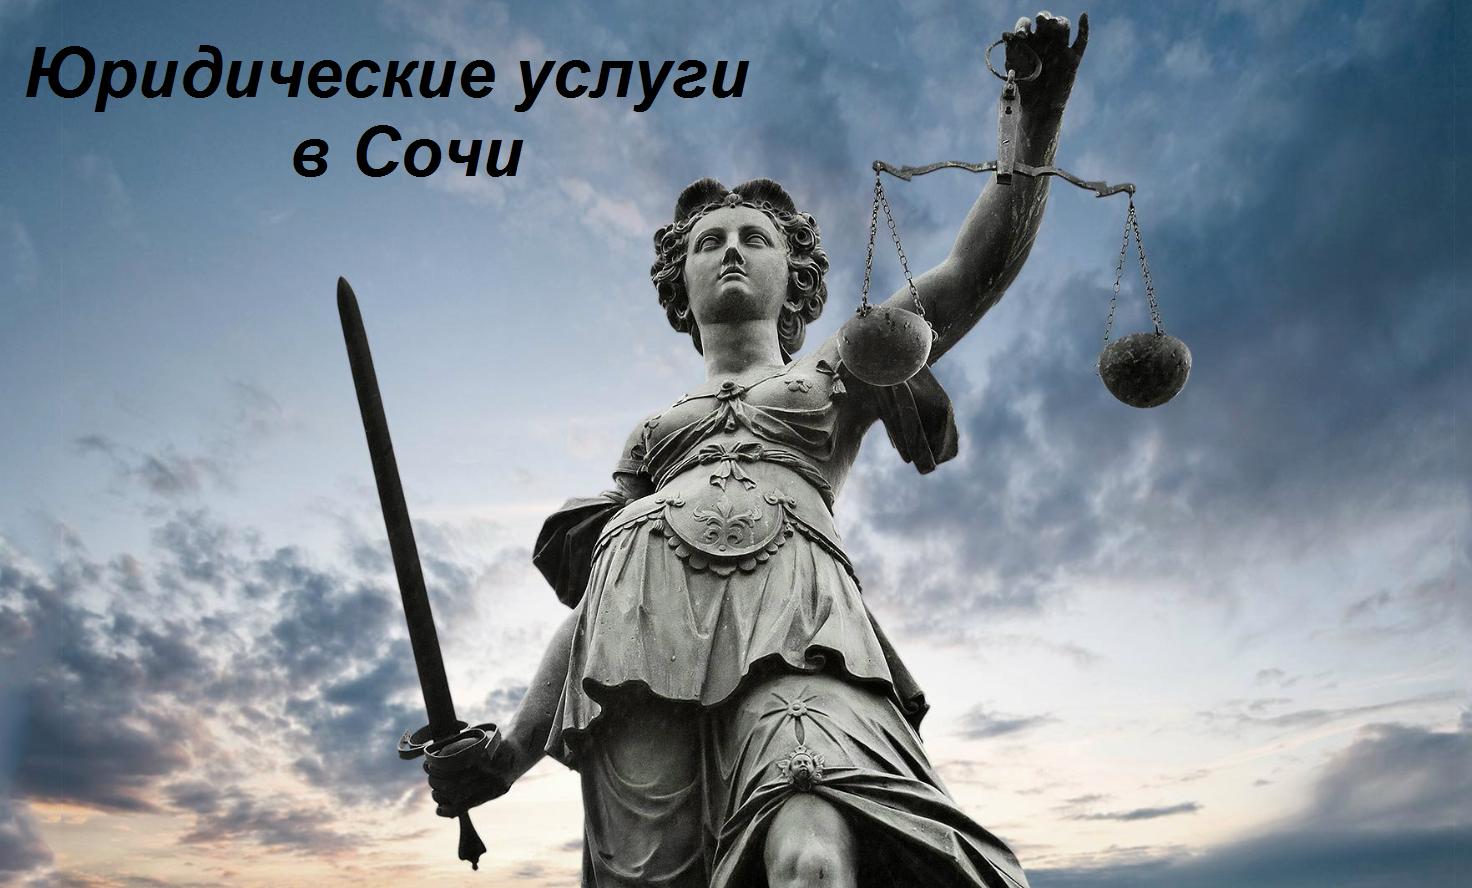 Юридические услуги в Сочи